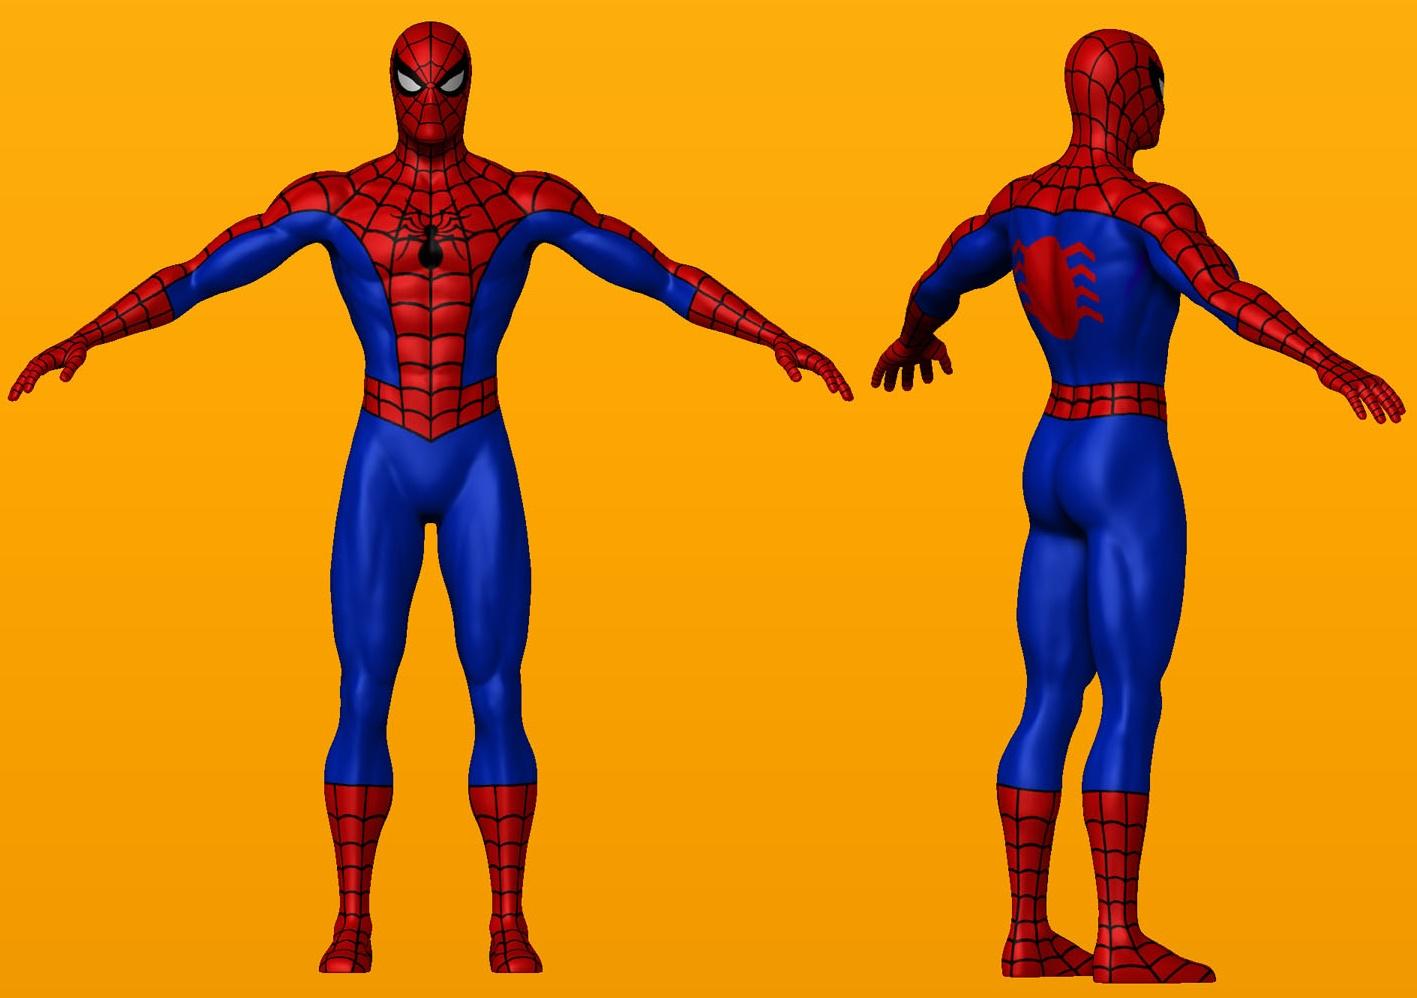 Spiderman se coge a marin de aacuteguila - 2 4